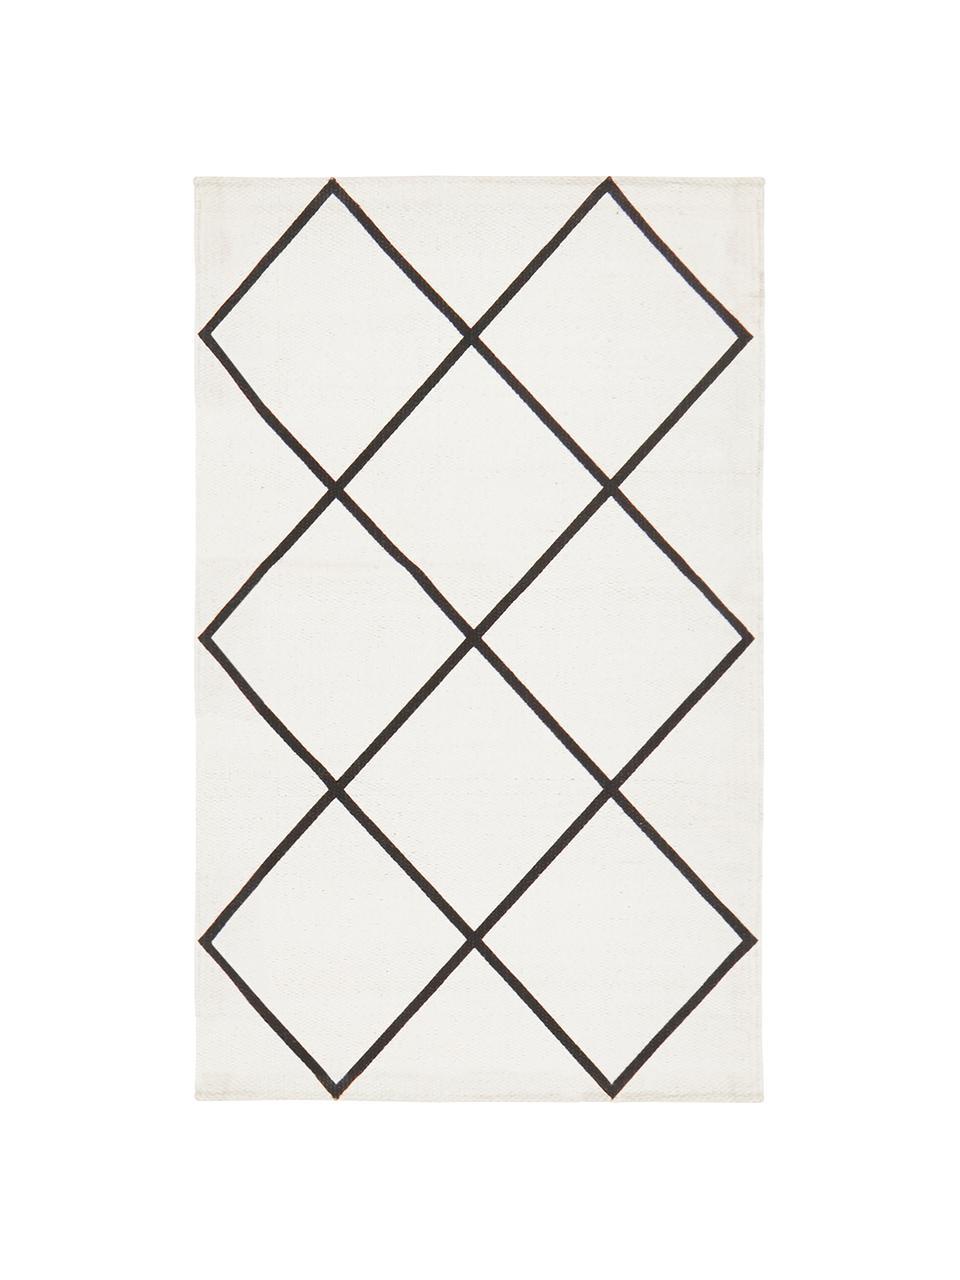 Alfombra de algodón Farah, 100%algodón, Blanco crema, negro, An 200 x L 300 cm (Tamaño L)